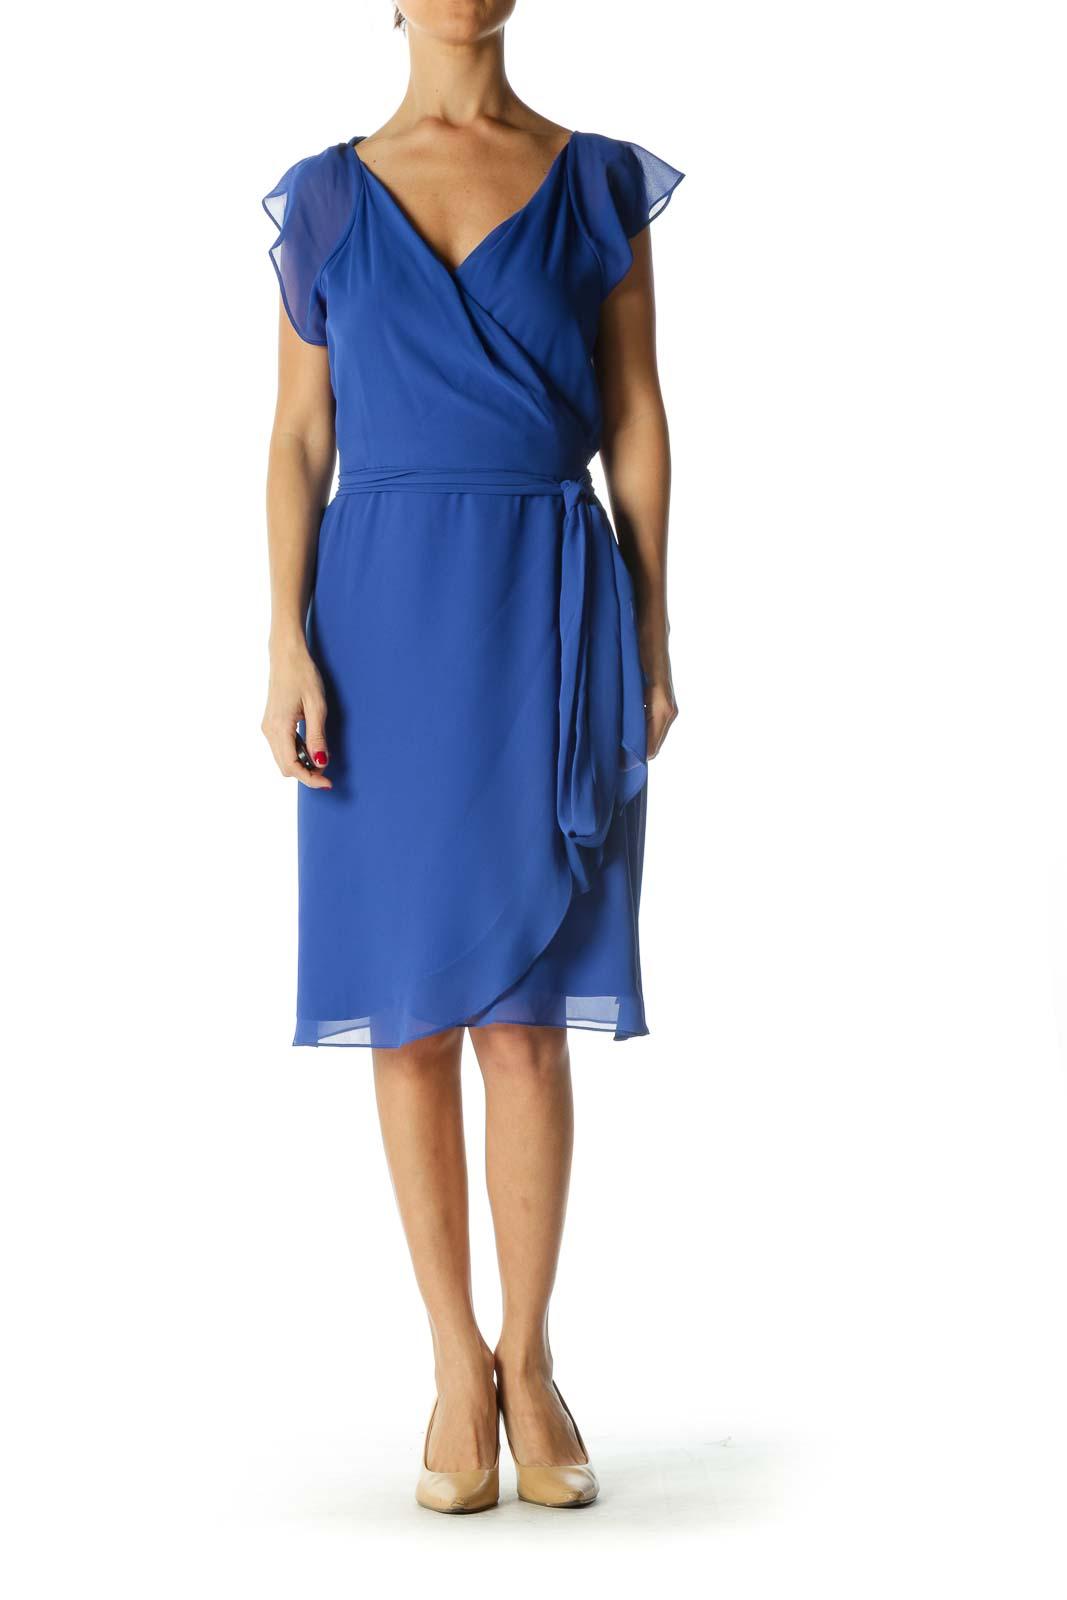 Blue Tie-Front Dress